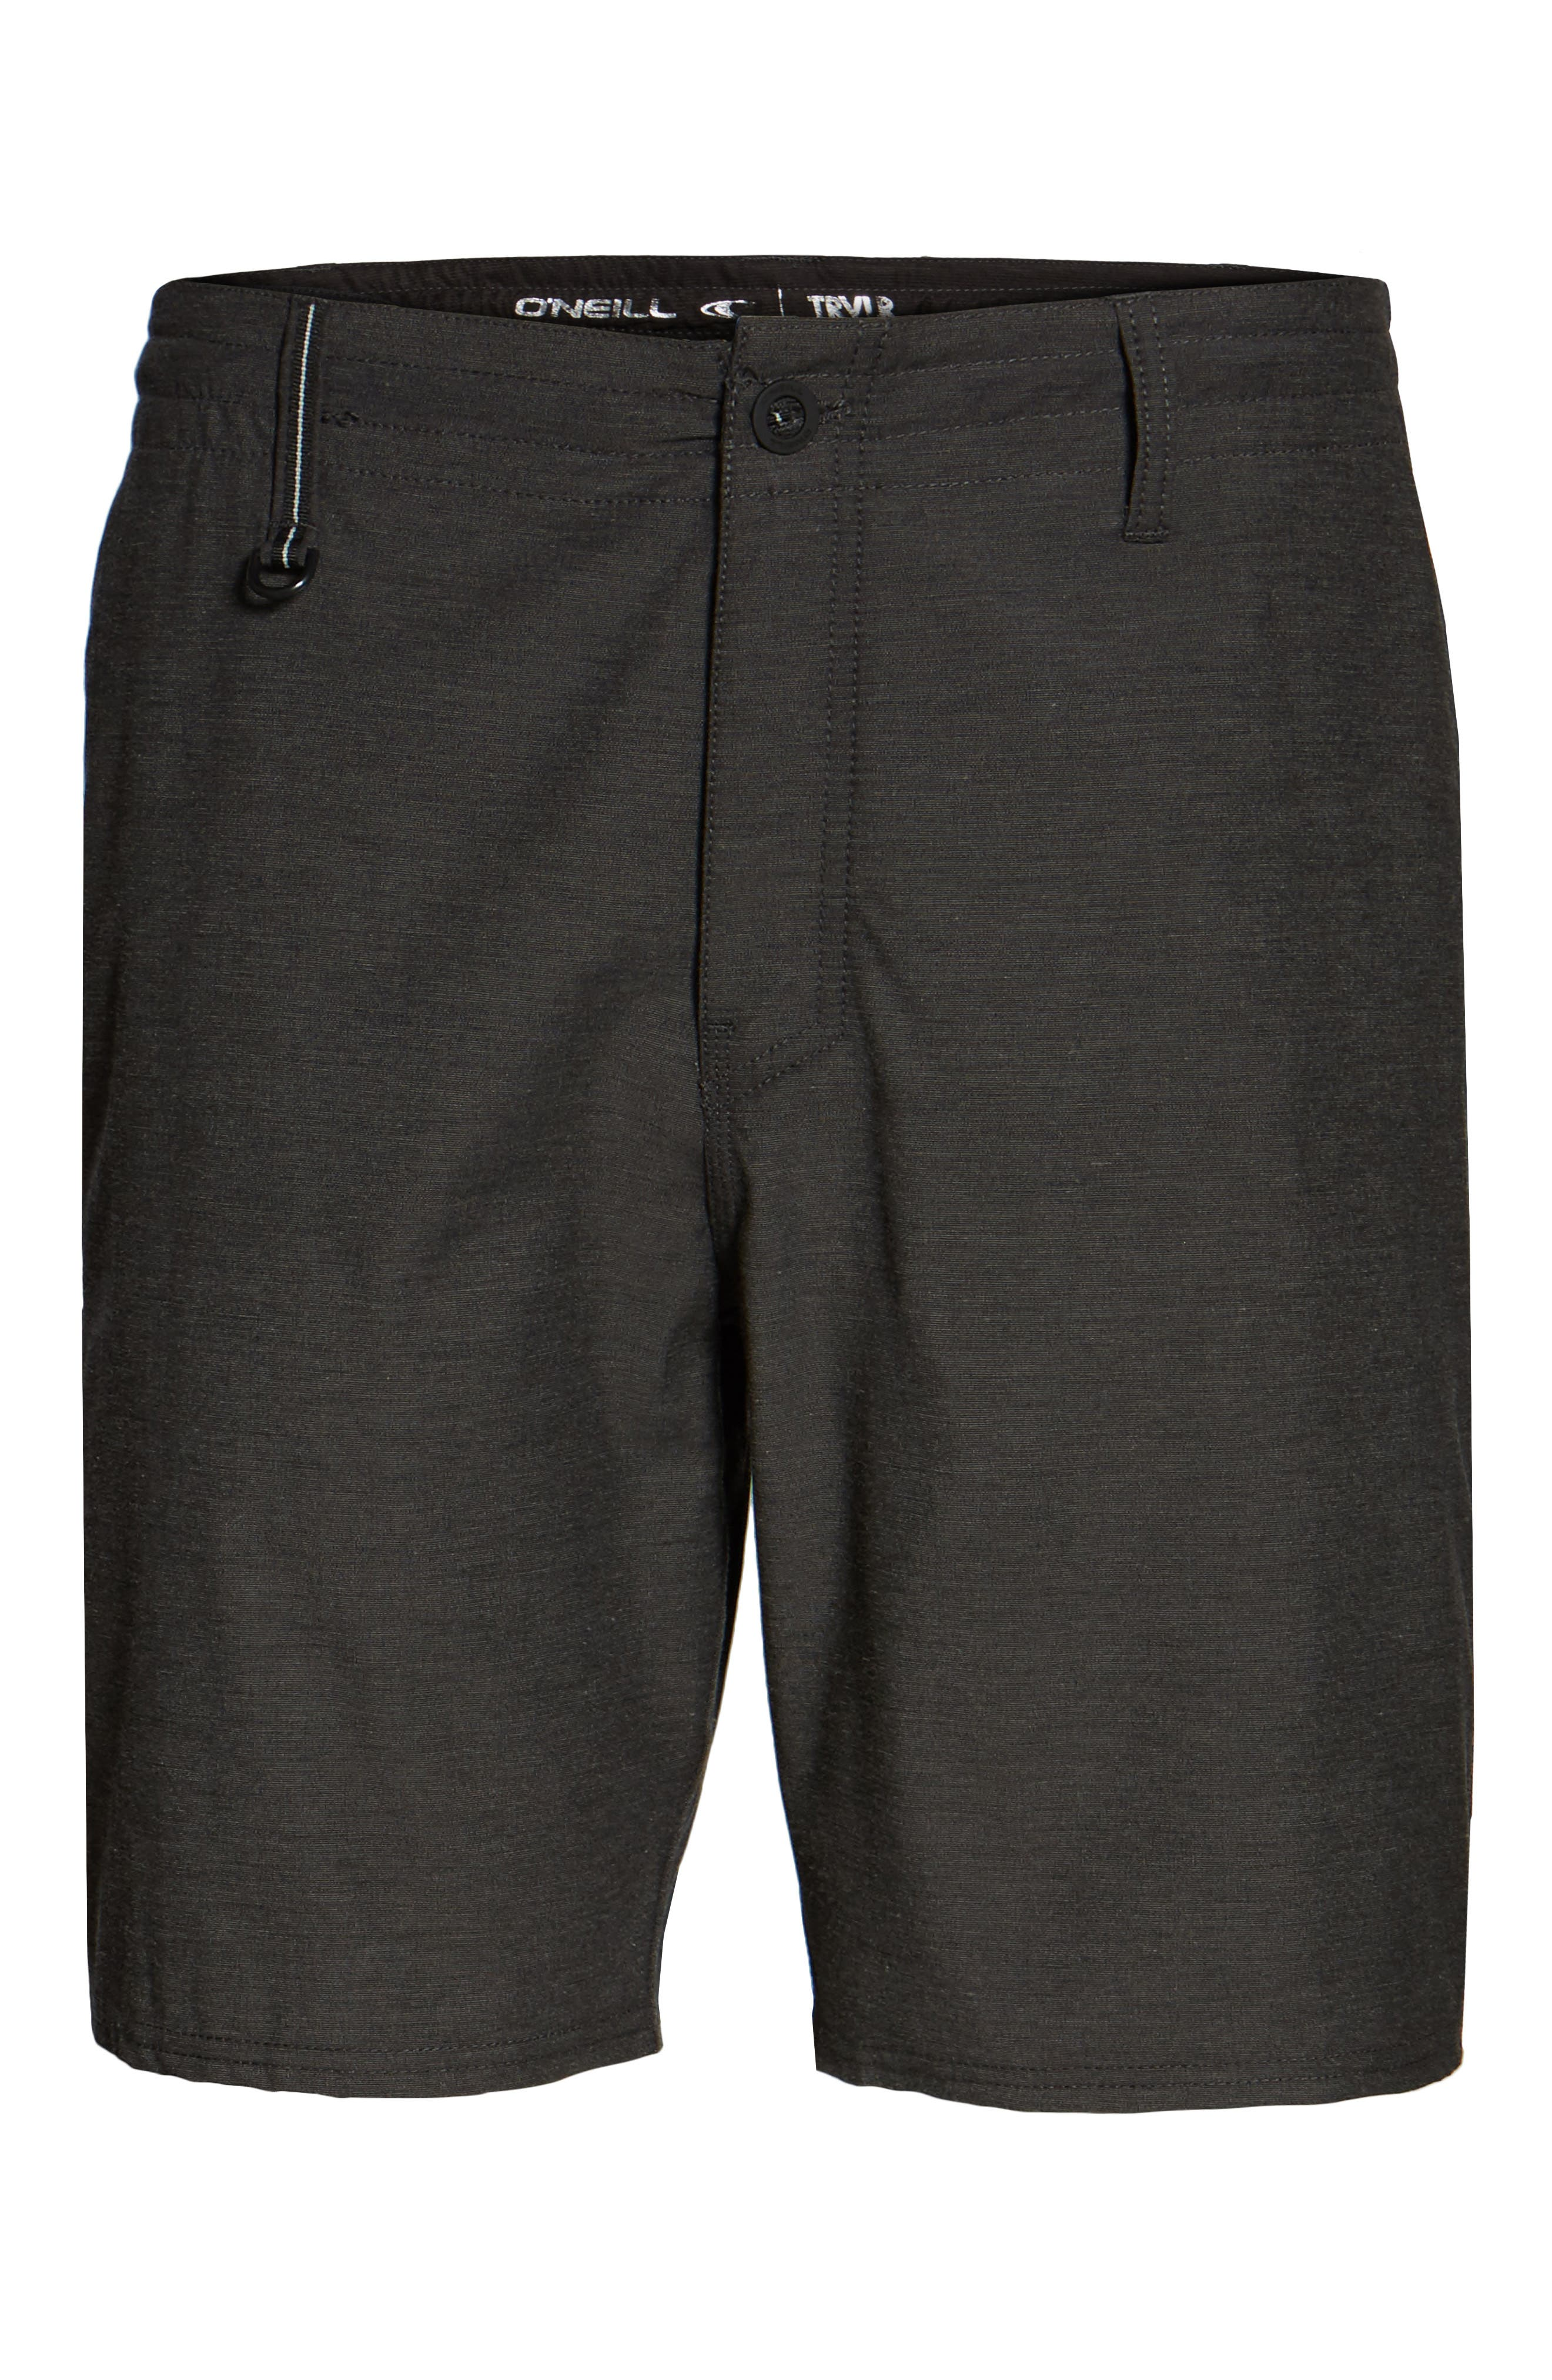 Traveler Recon Hybrid Shorts,                             Alternate thumbnail 6, color,                             Black